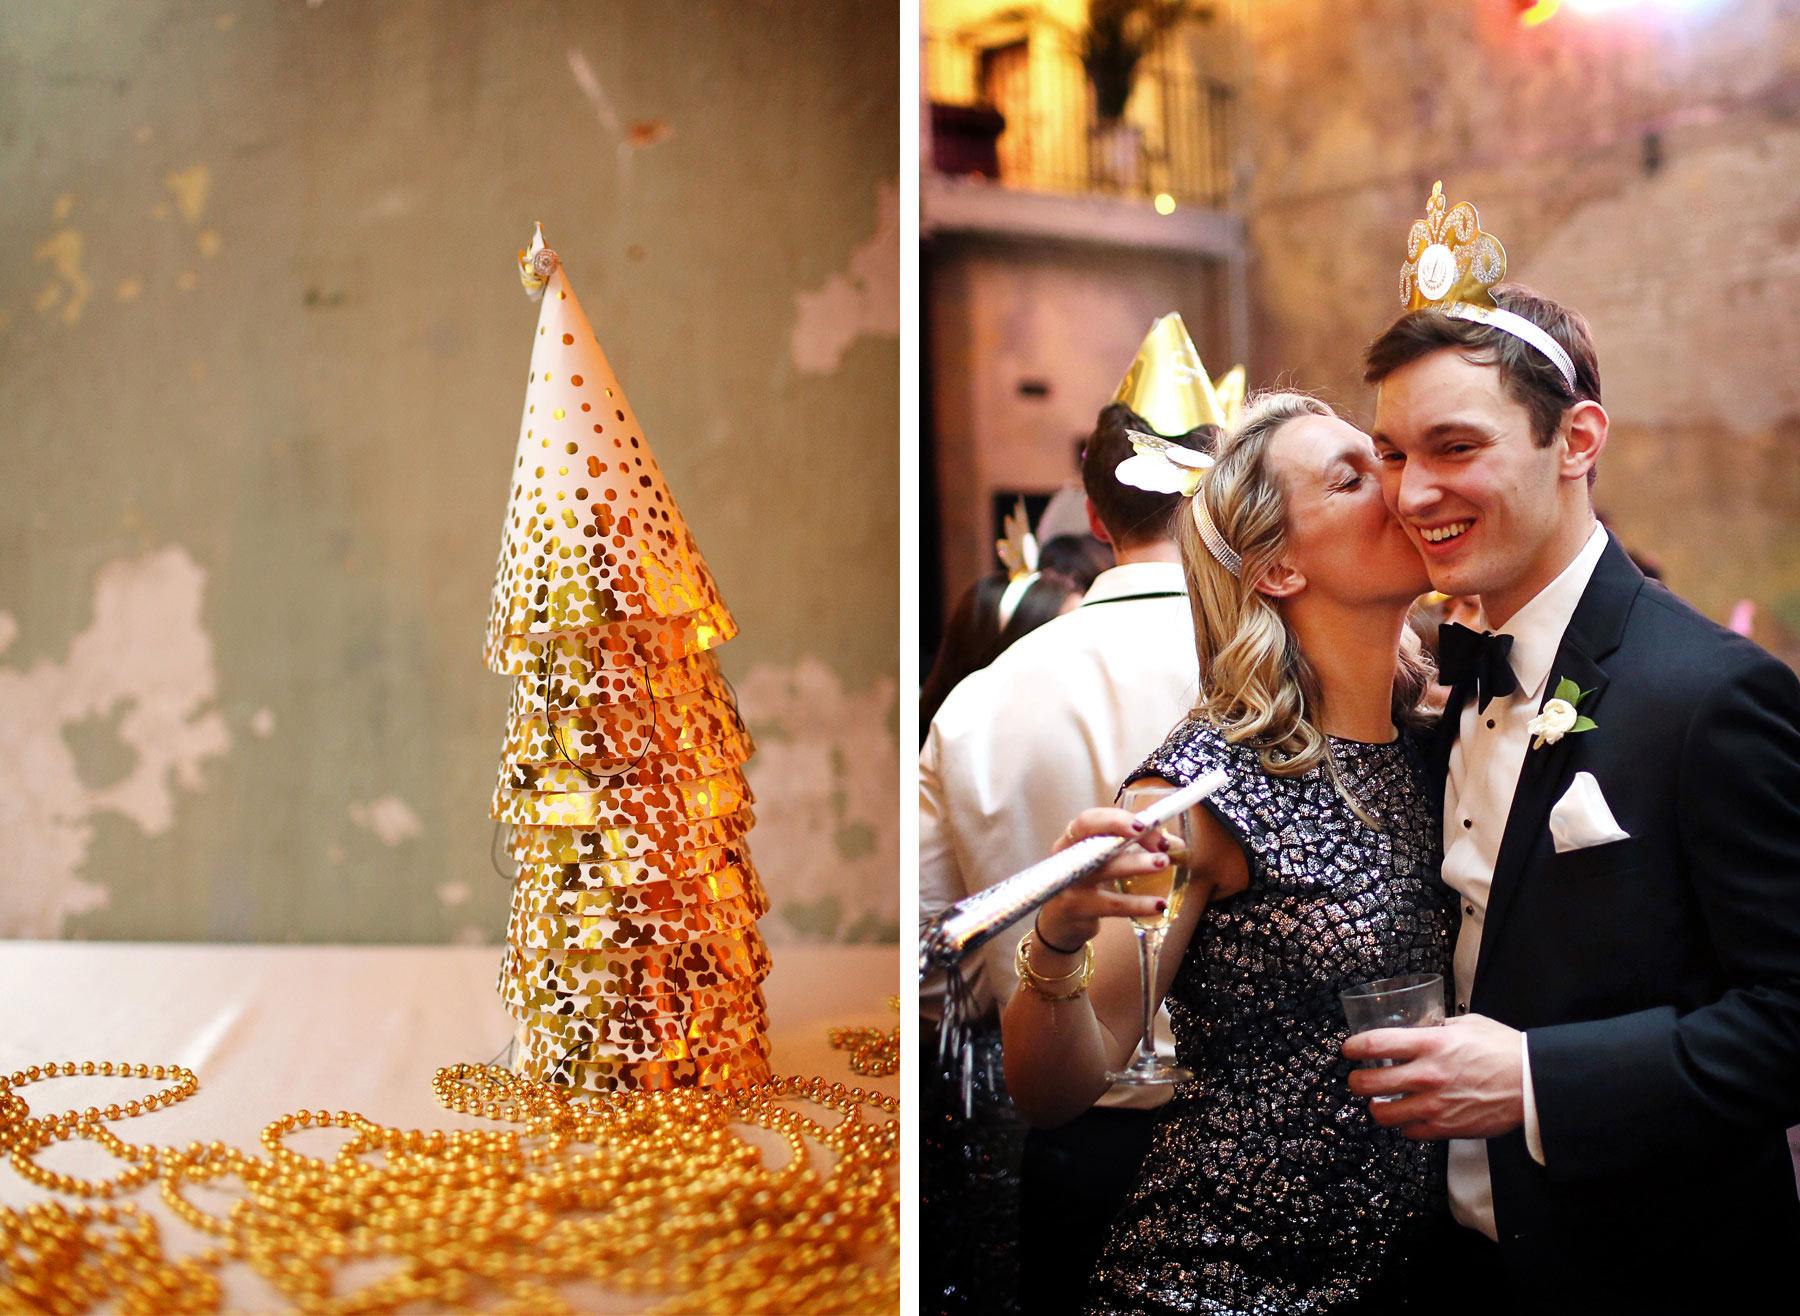 20-Minneapolis-Minnesota-Wedding-Photography-by-Vick-Photography-Aria-New-Years-Eve-Reception-Caroline-and-J.jpg